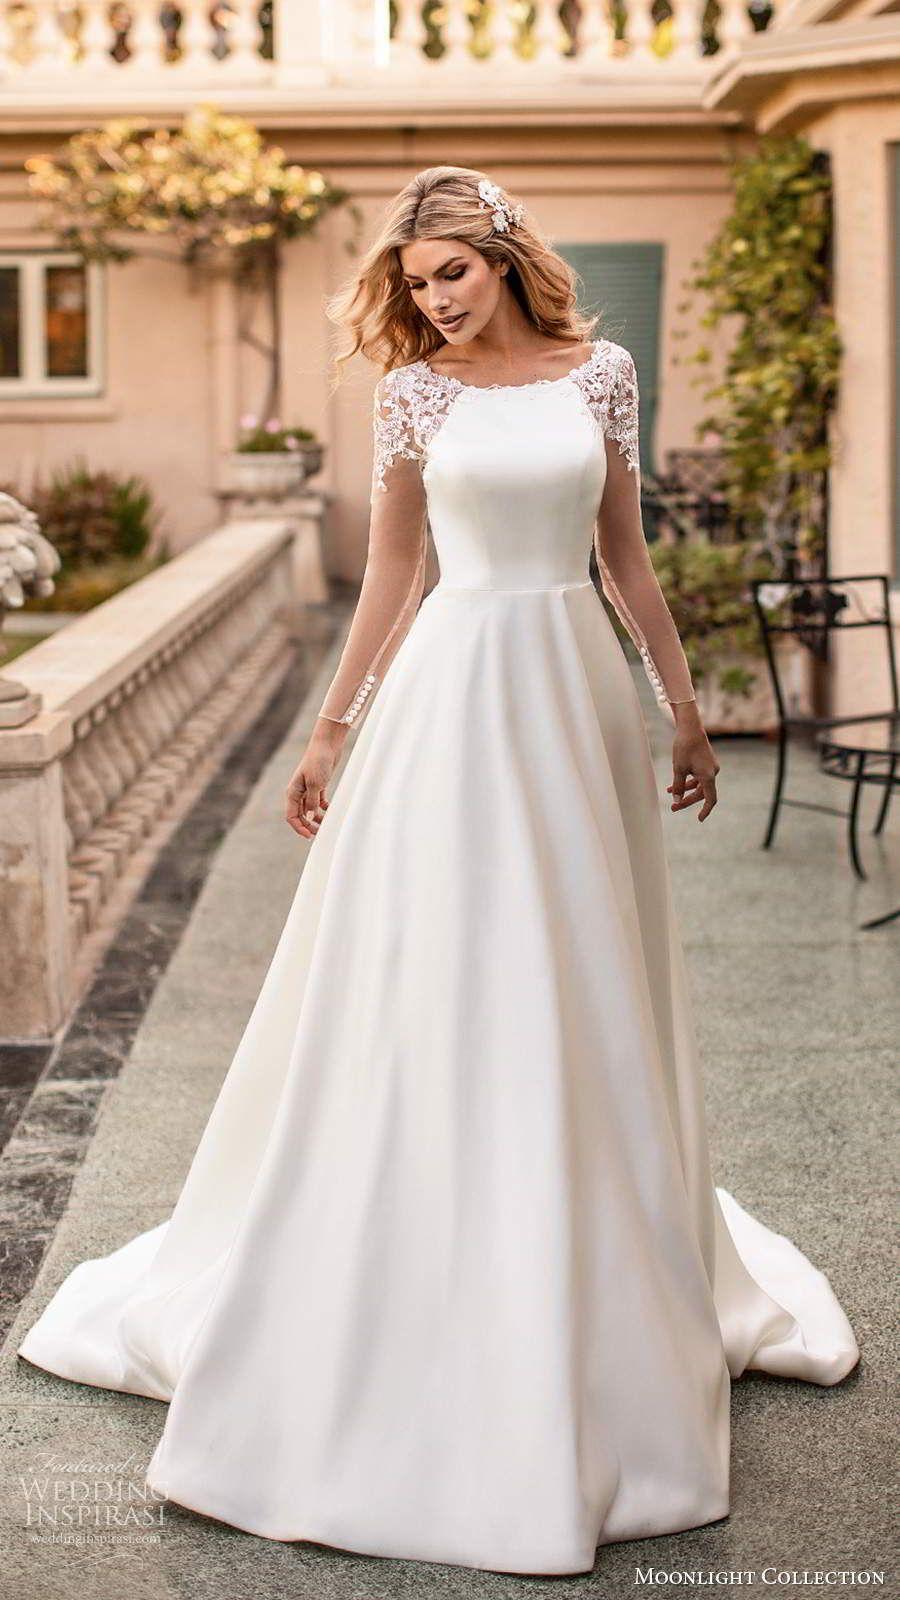 Moonlight Collection Fall 2020 Wedding Dresses Wedding Inspirasi Spring Wedding Dress Wedding Dresses Bridal Dresses [ 1600 x 900 Pixel ]